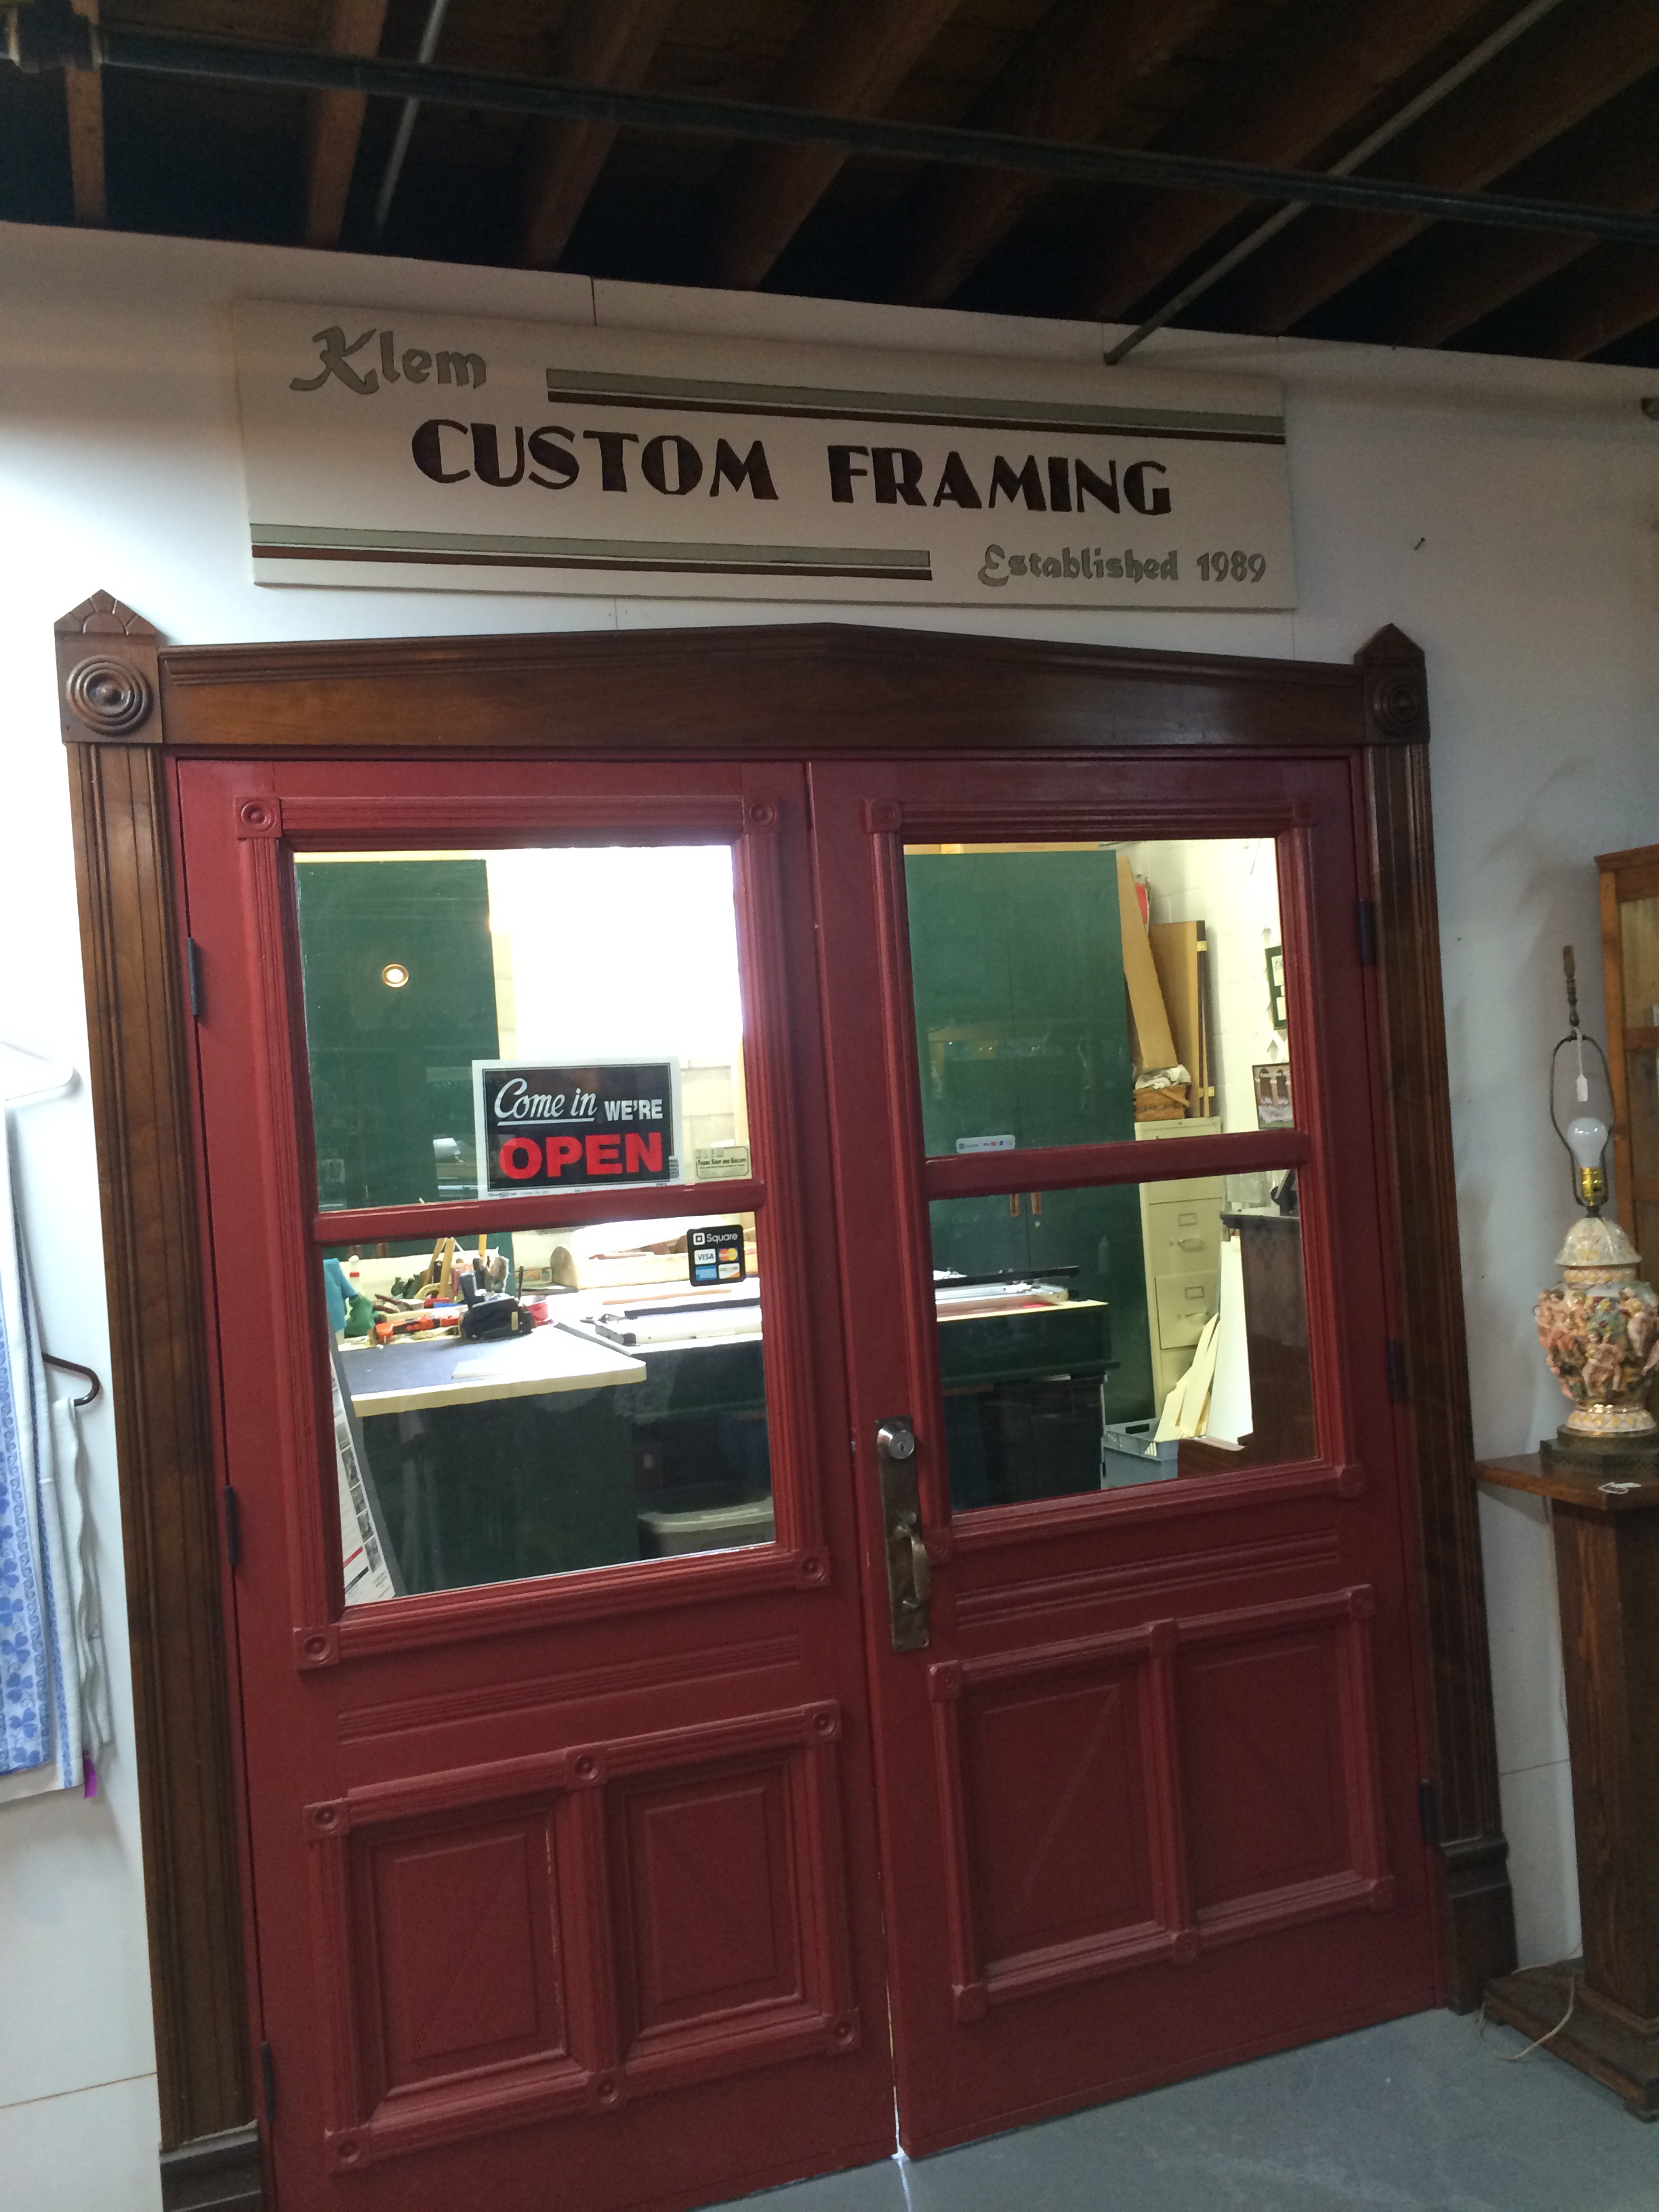 Klem Frame Shop inside the Ferdinand Antique Emporium at 1440 Main Street, Ferdinand, IN